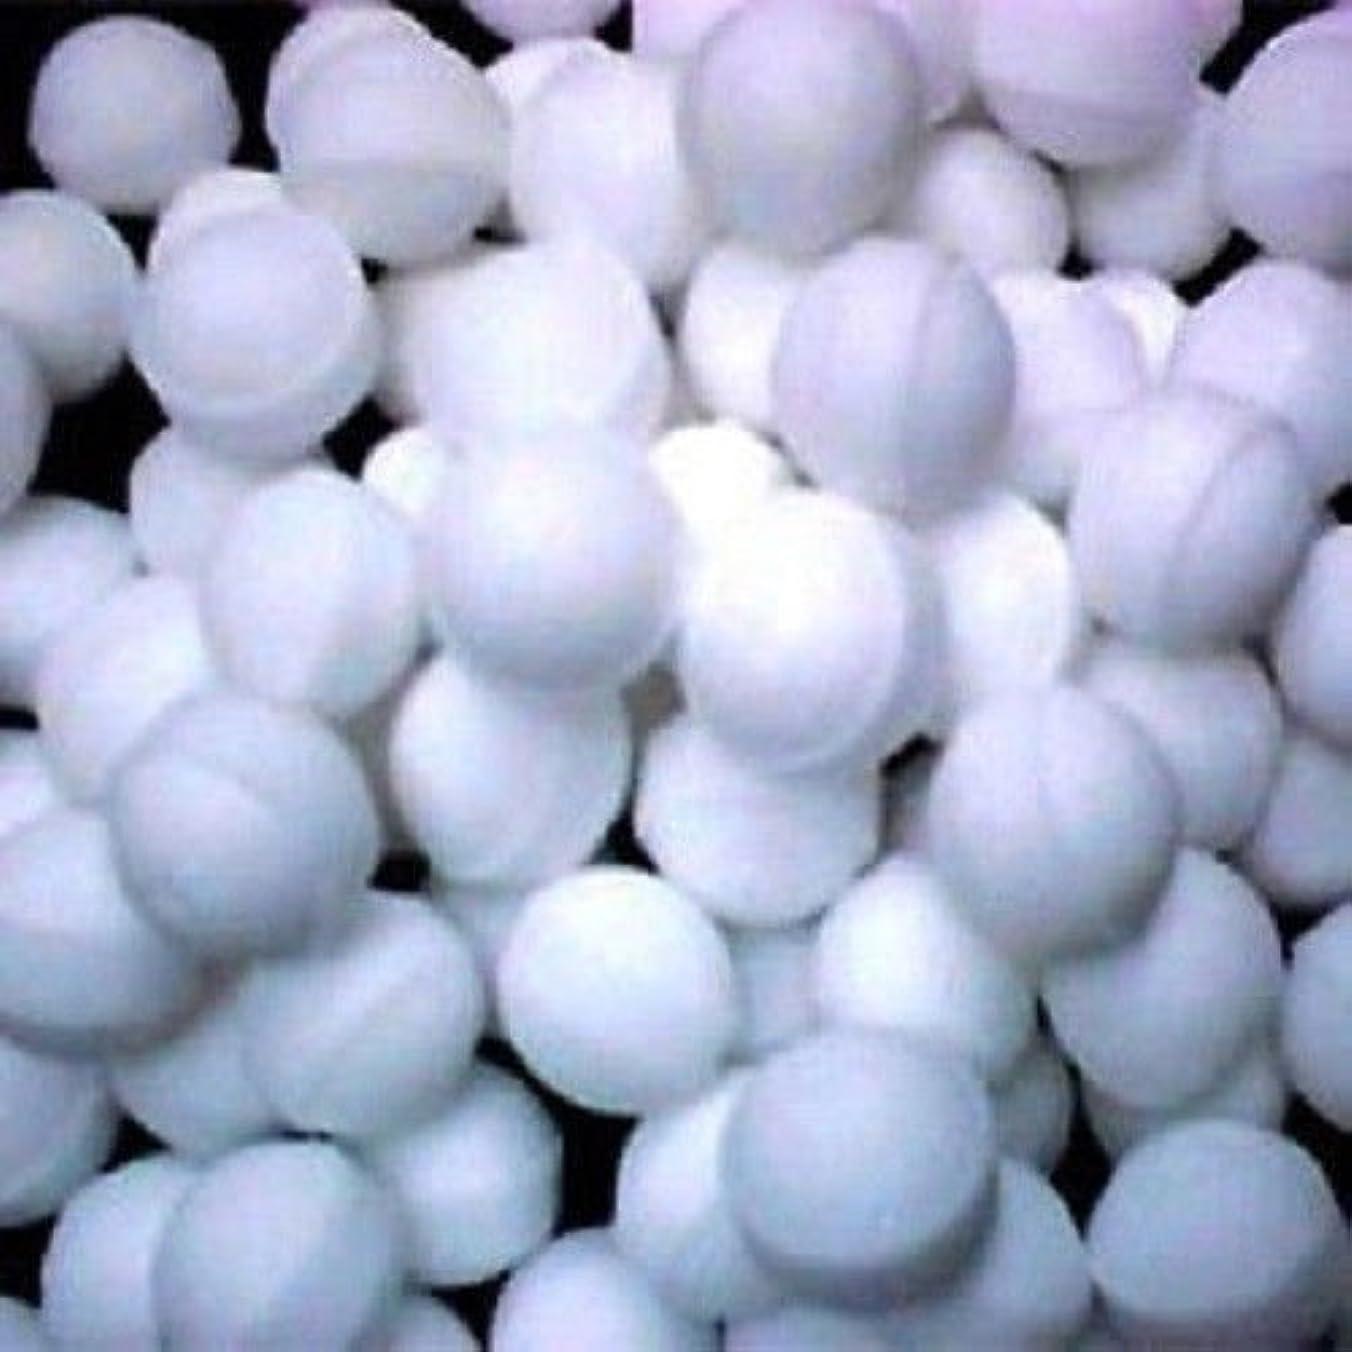 Naphthalene Balls, Moth Balls,snow White,toilets,cupboards,books,cloth Mothballs- 50 Balls 100g Pack by Eagle...